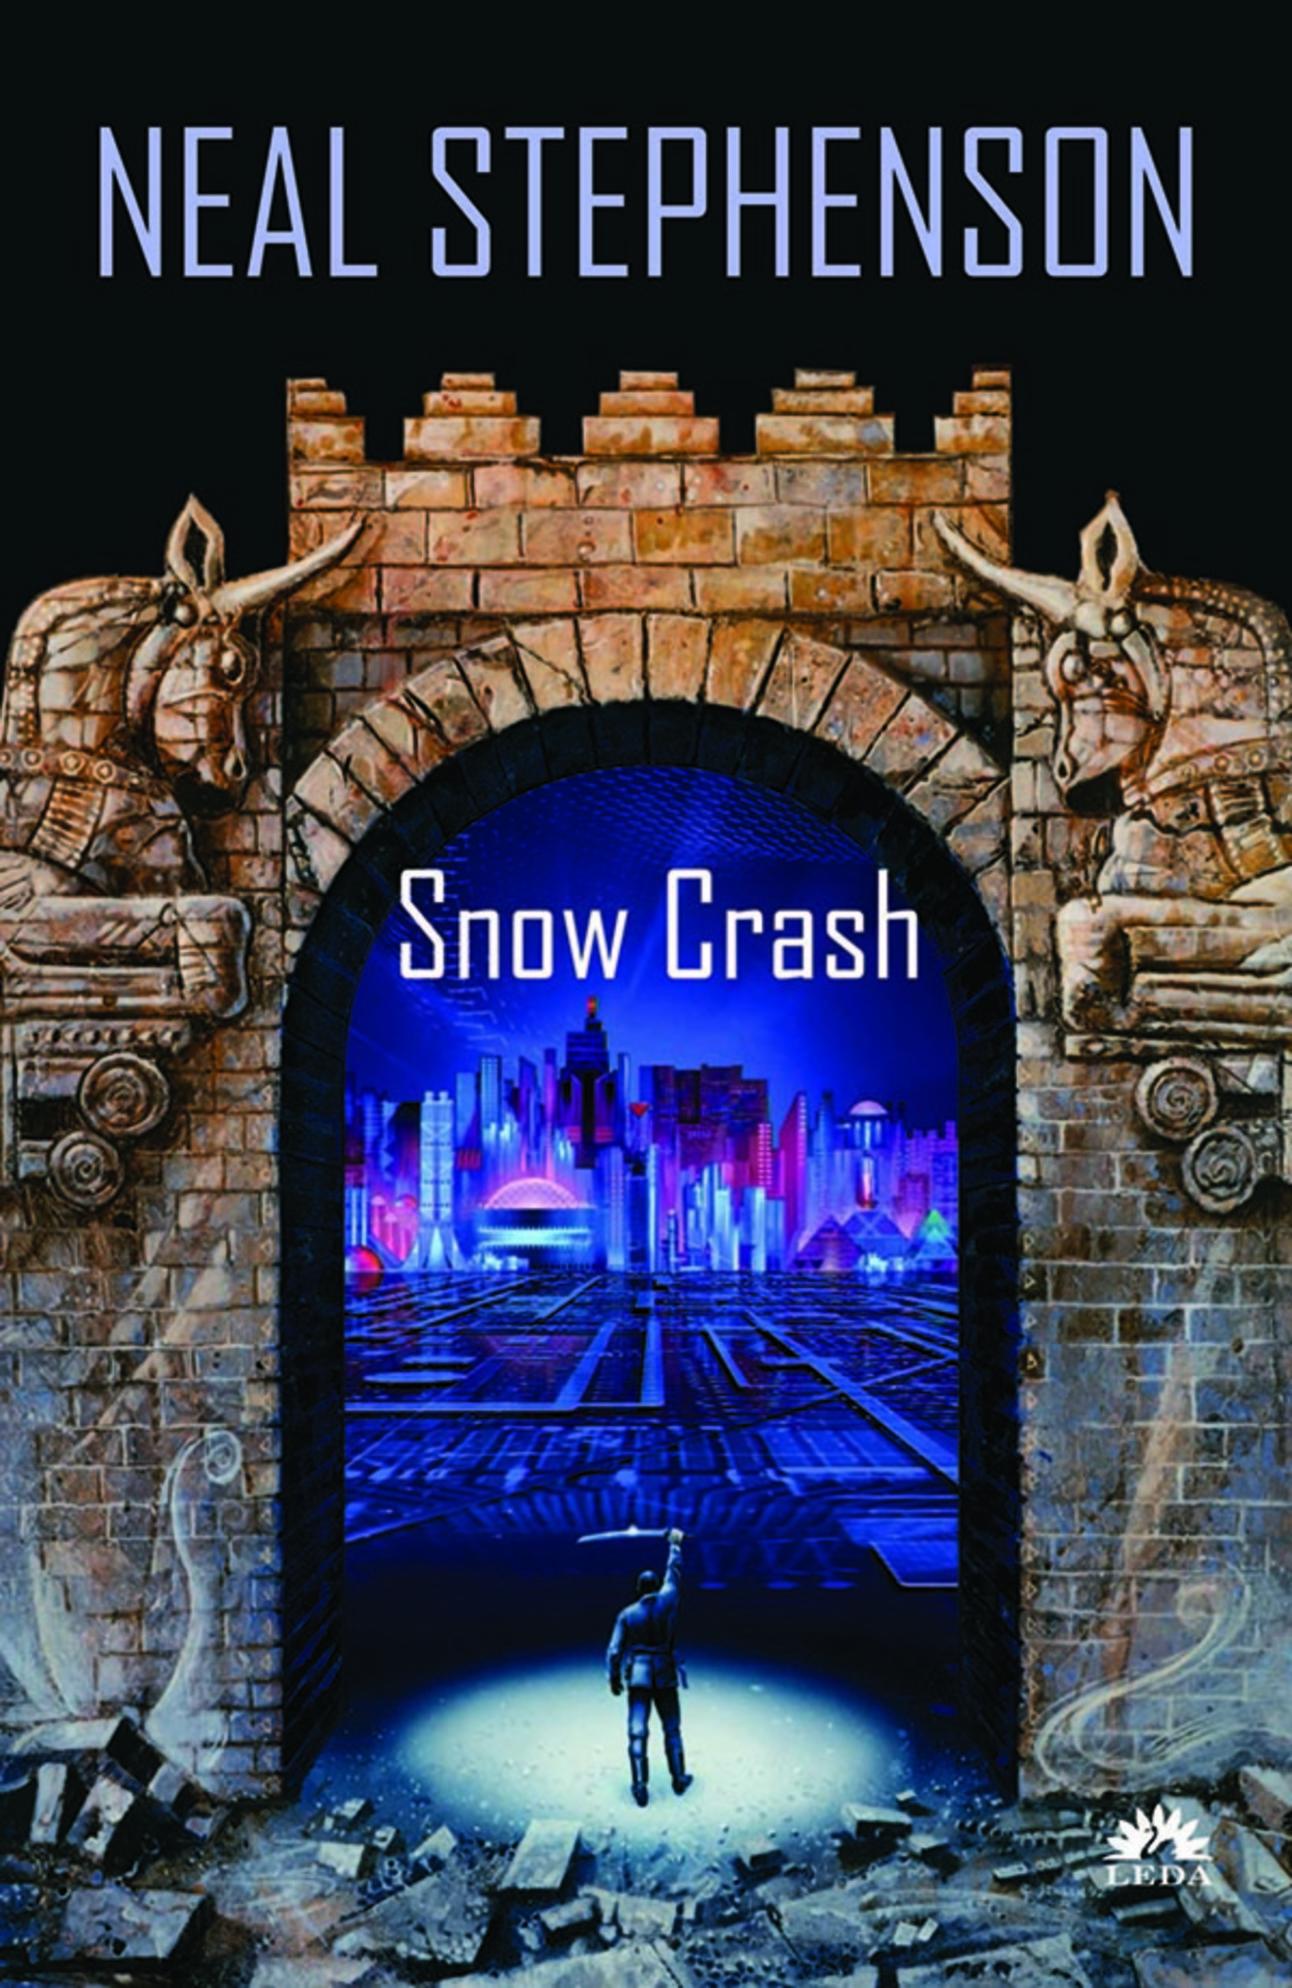 neal_stephenson_snow_crash_01.jpg